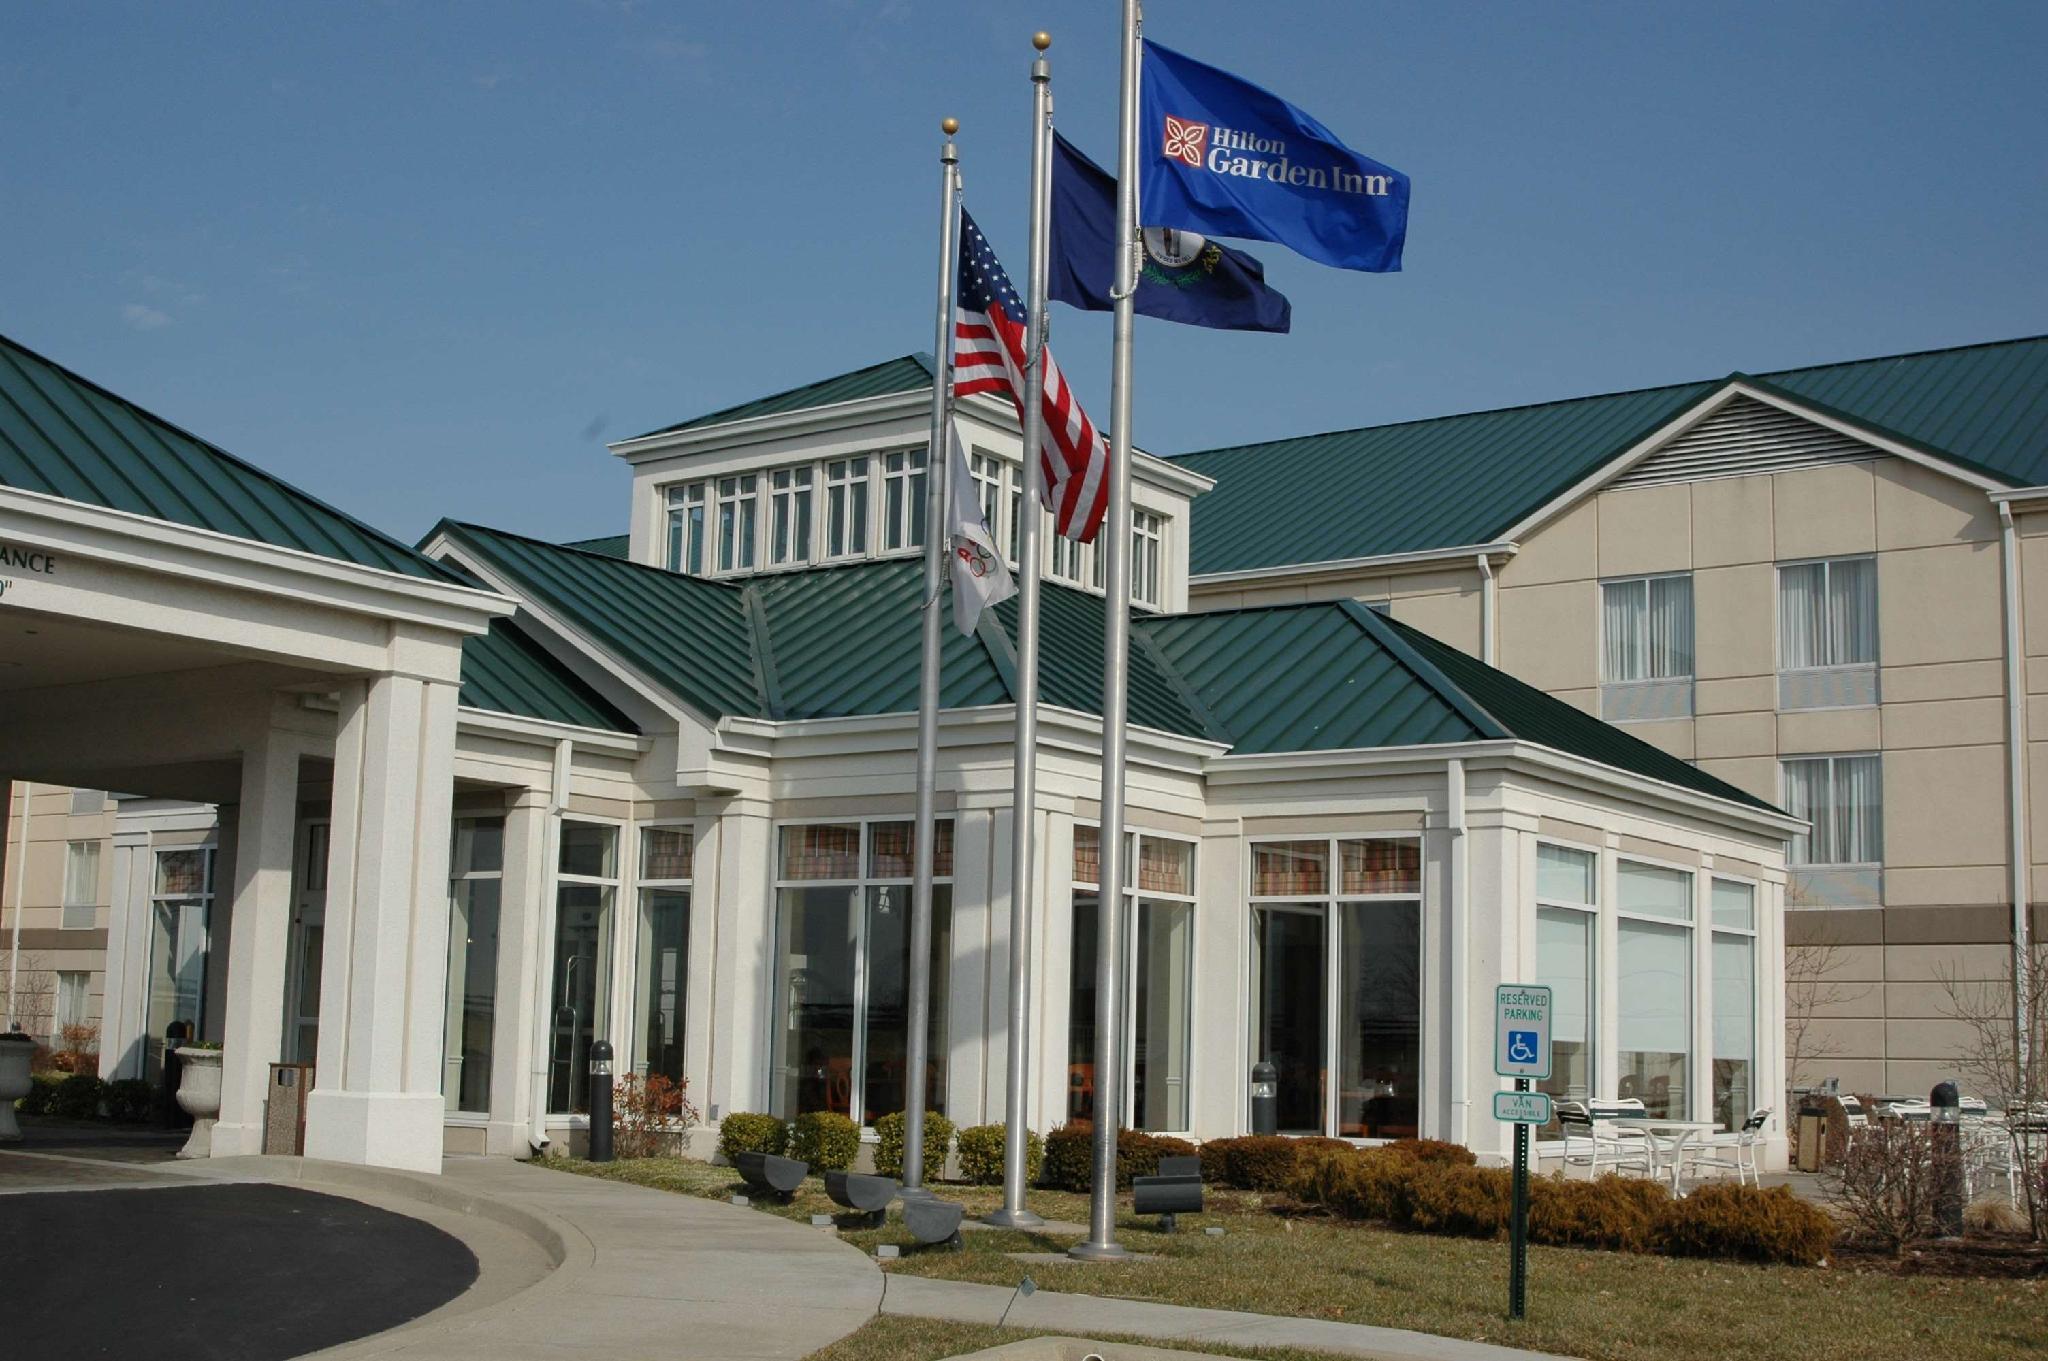 Hilton Garden Inn Louisville East Hotel